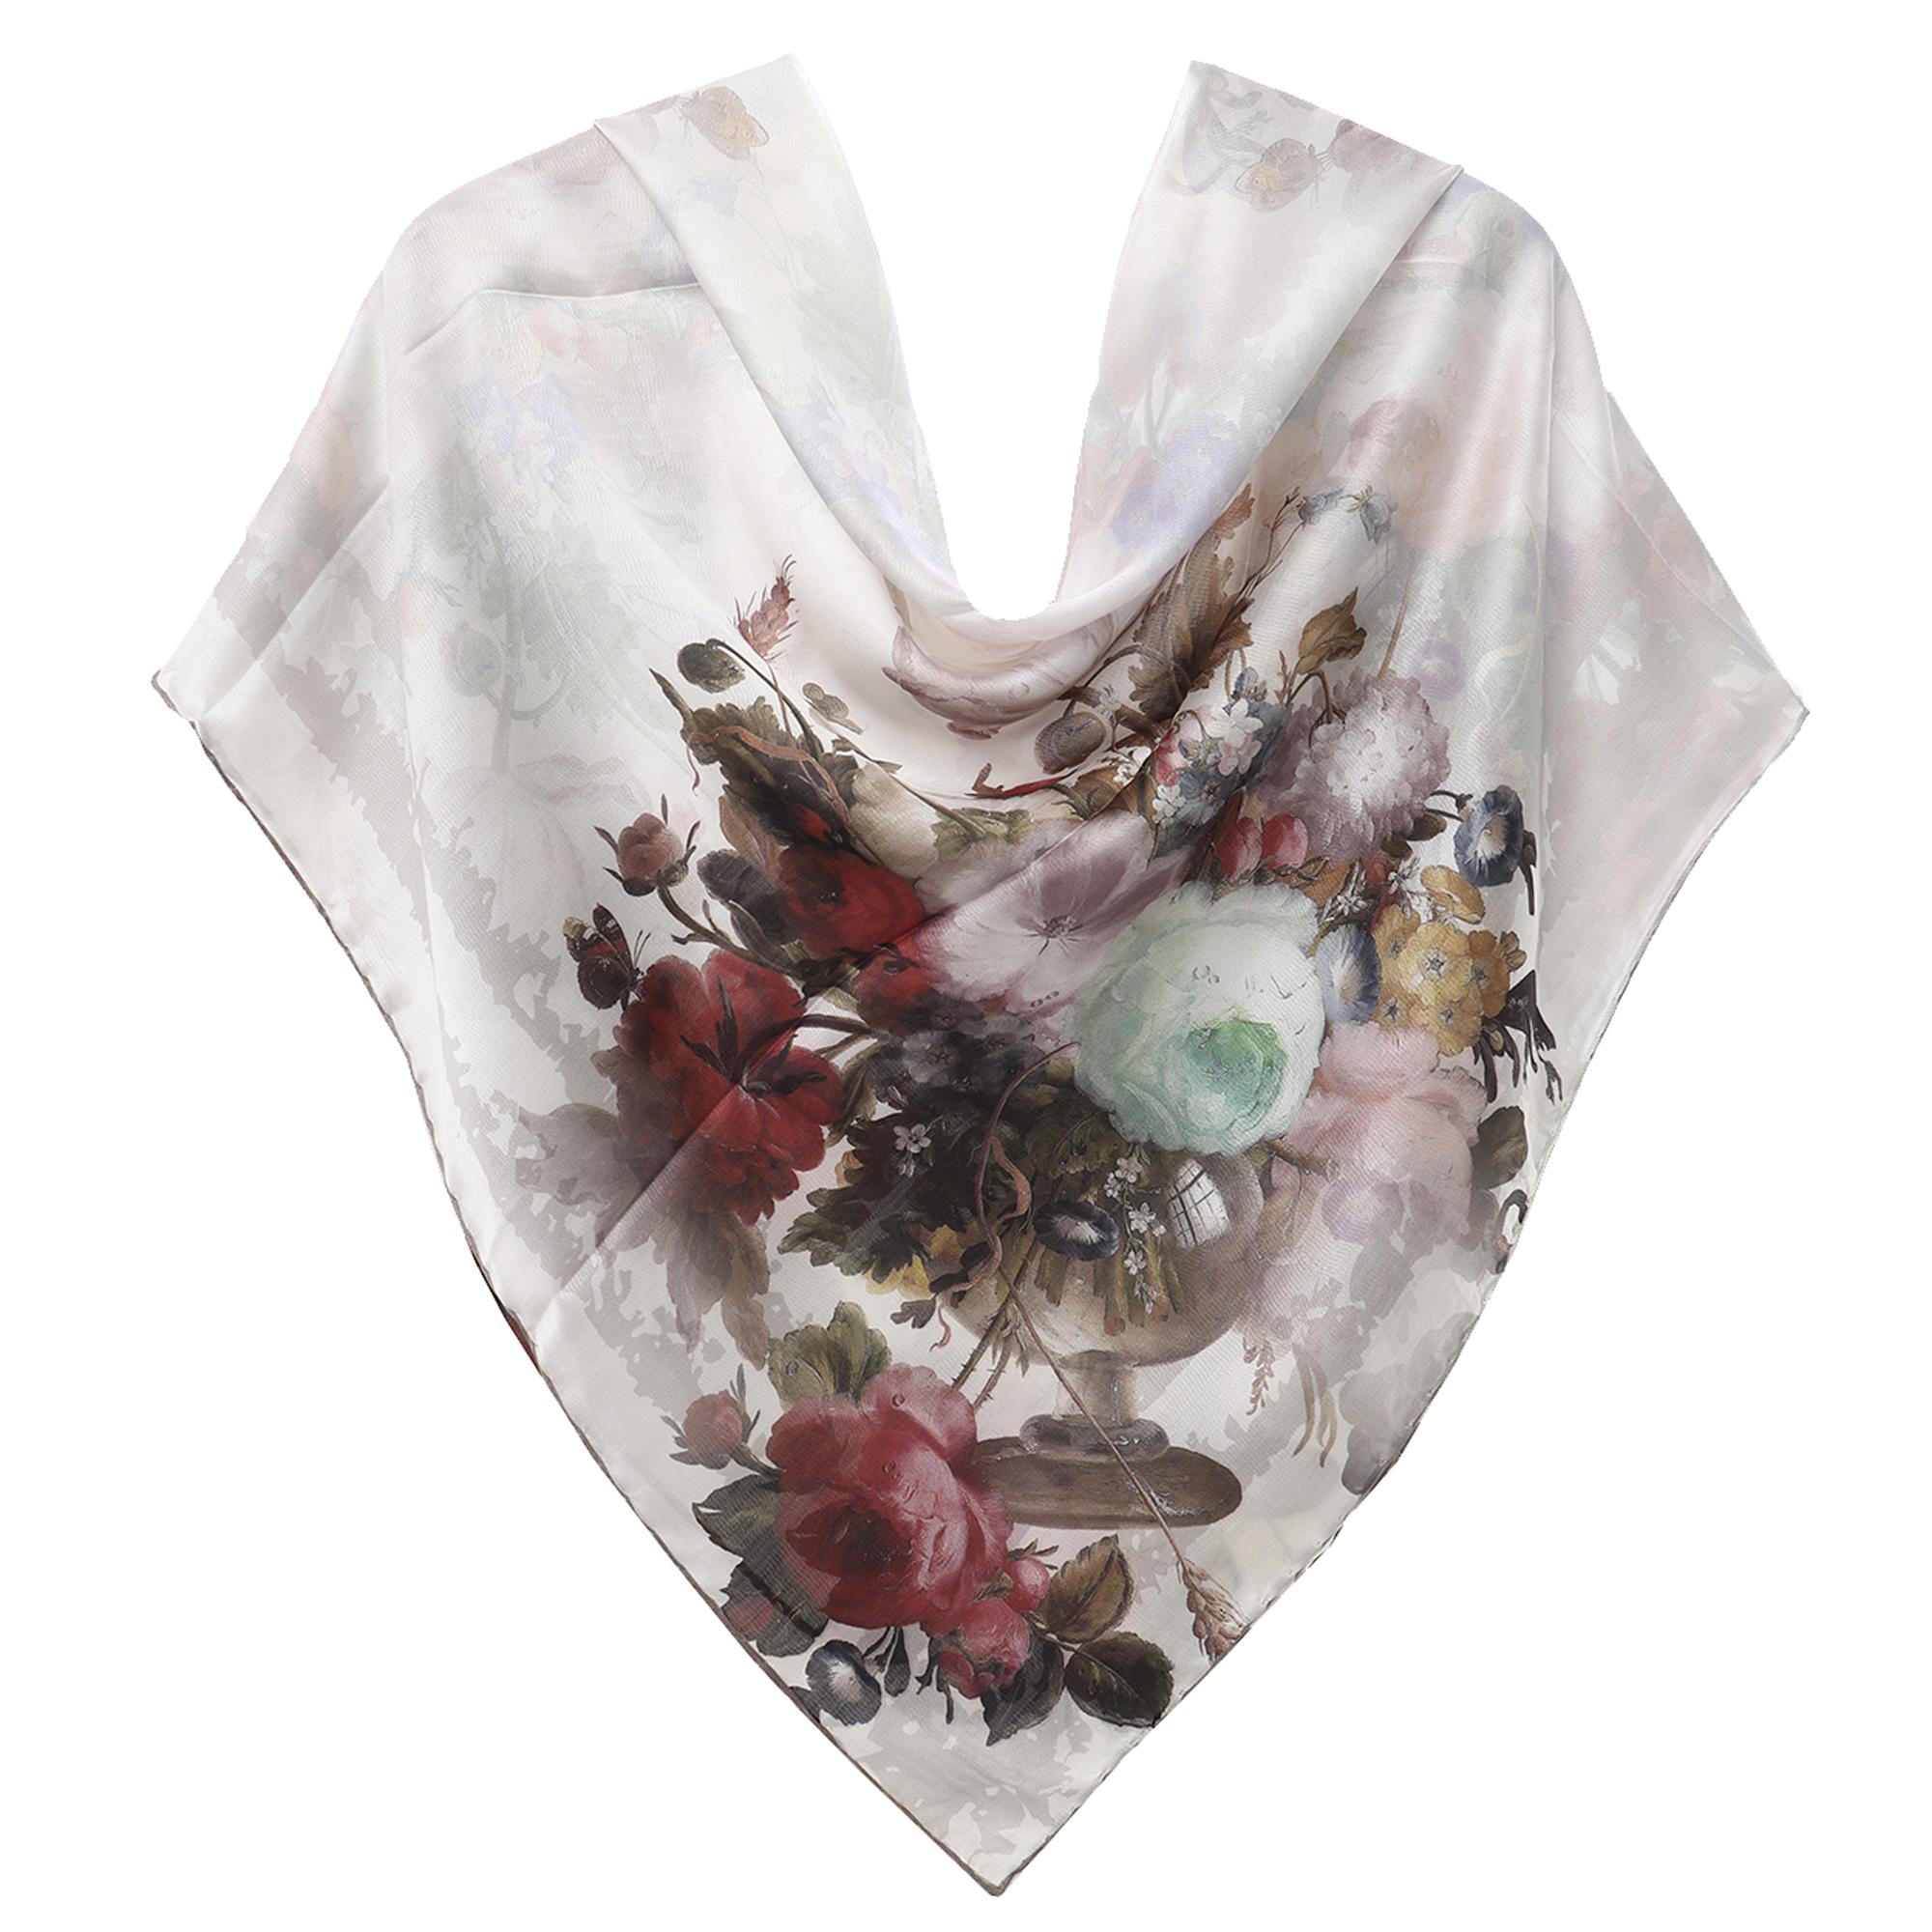 روسری زنانه کد tp-3957-48